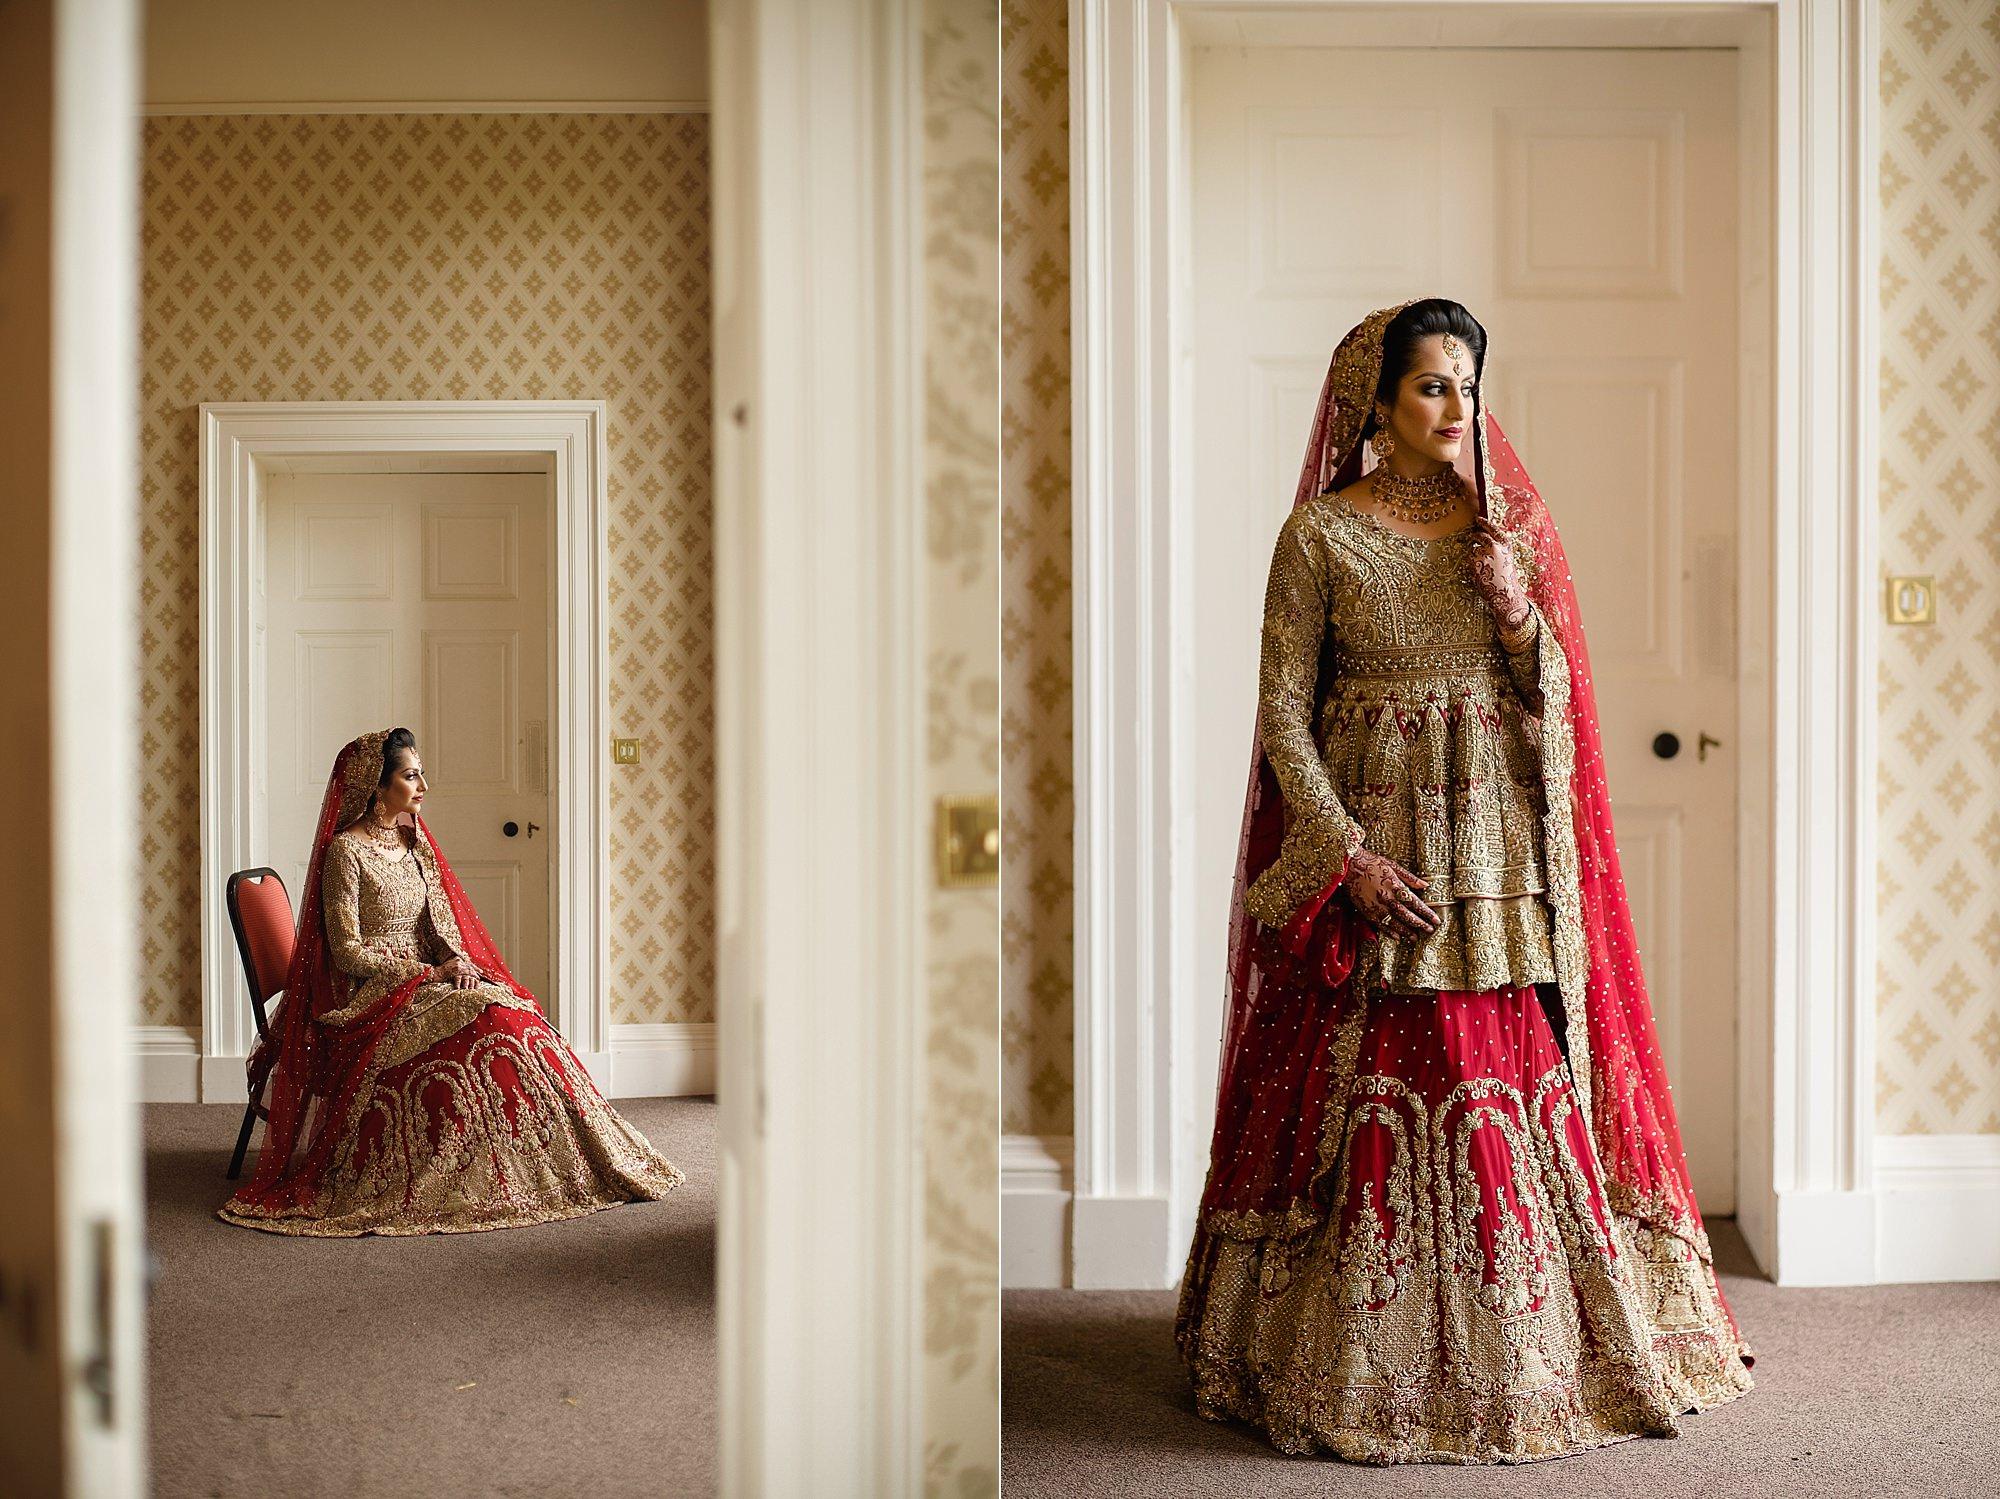 Pakistani Bride wedding portraits at Tatton Park Cheshire